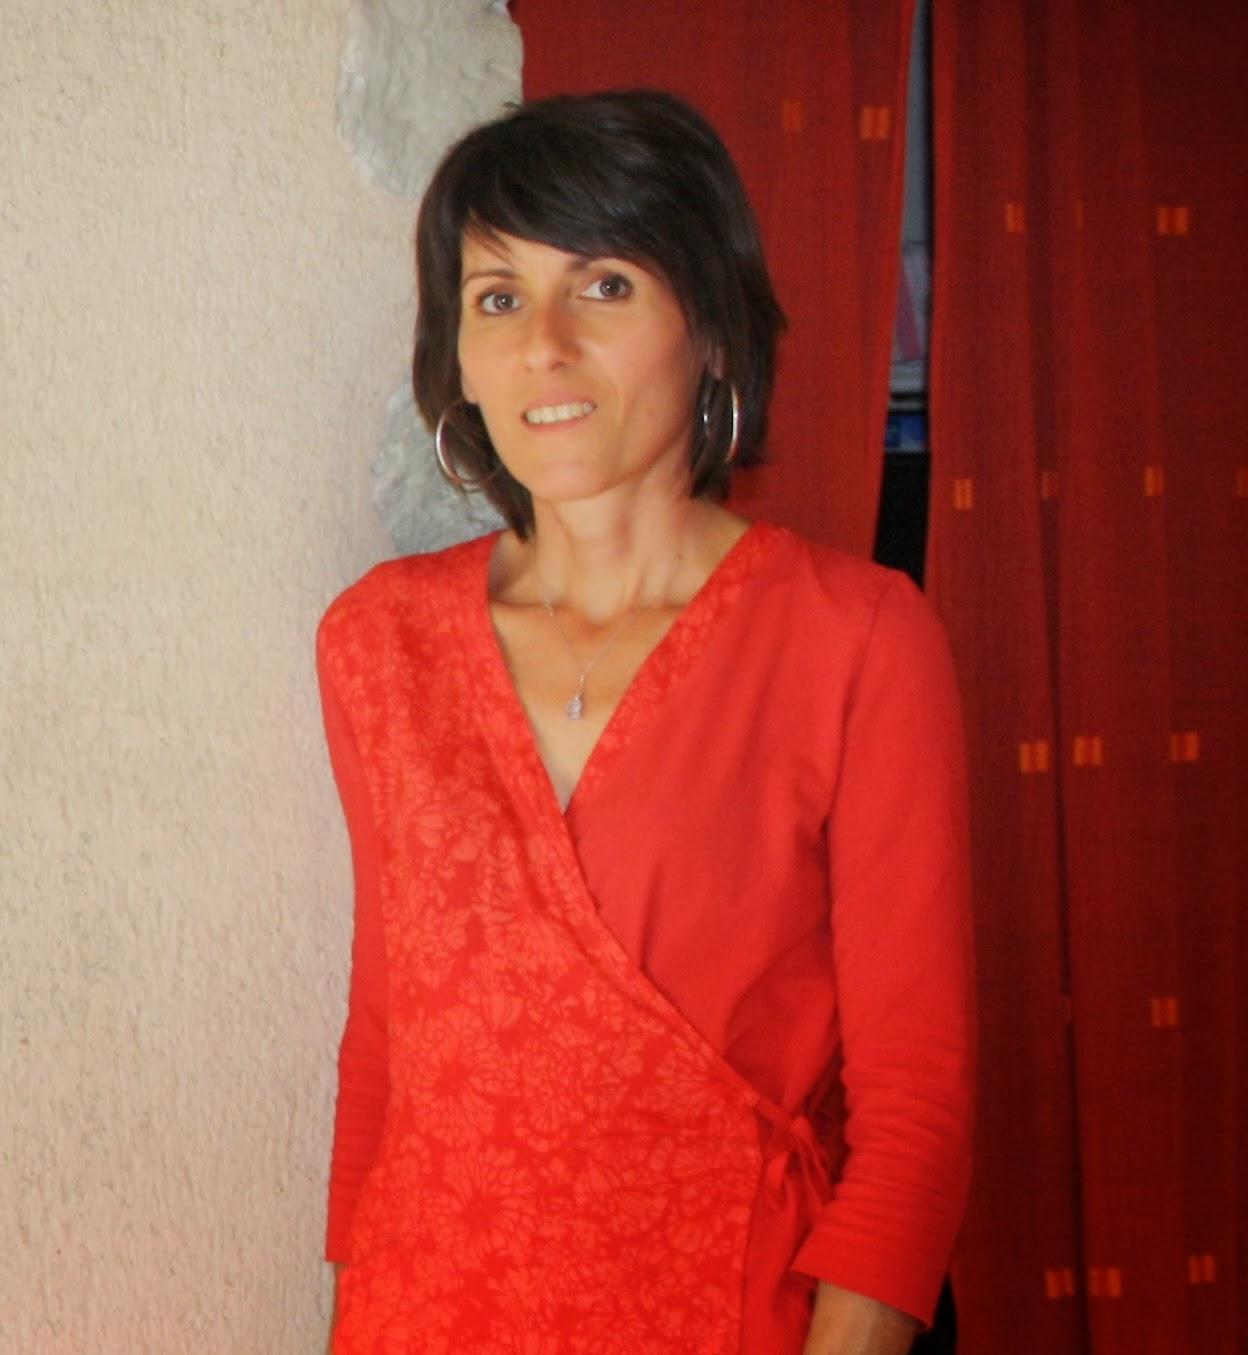 Nathalie Macioszek